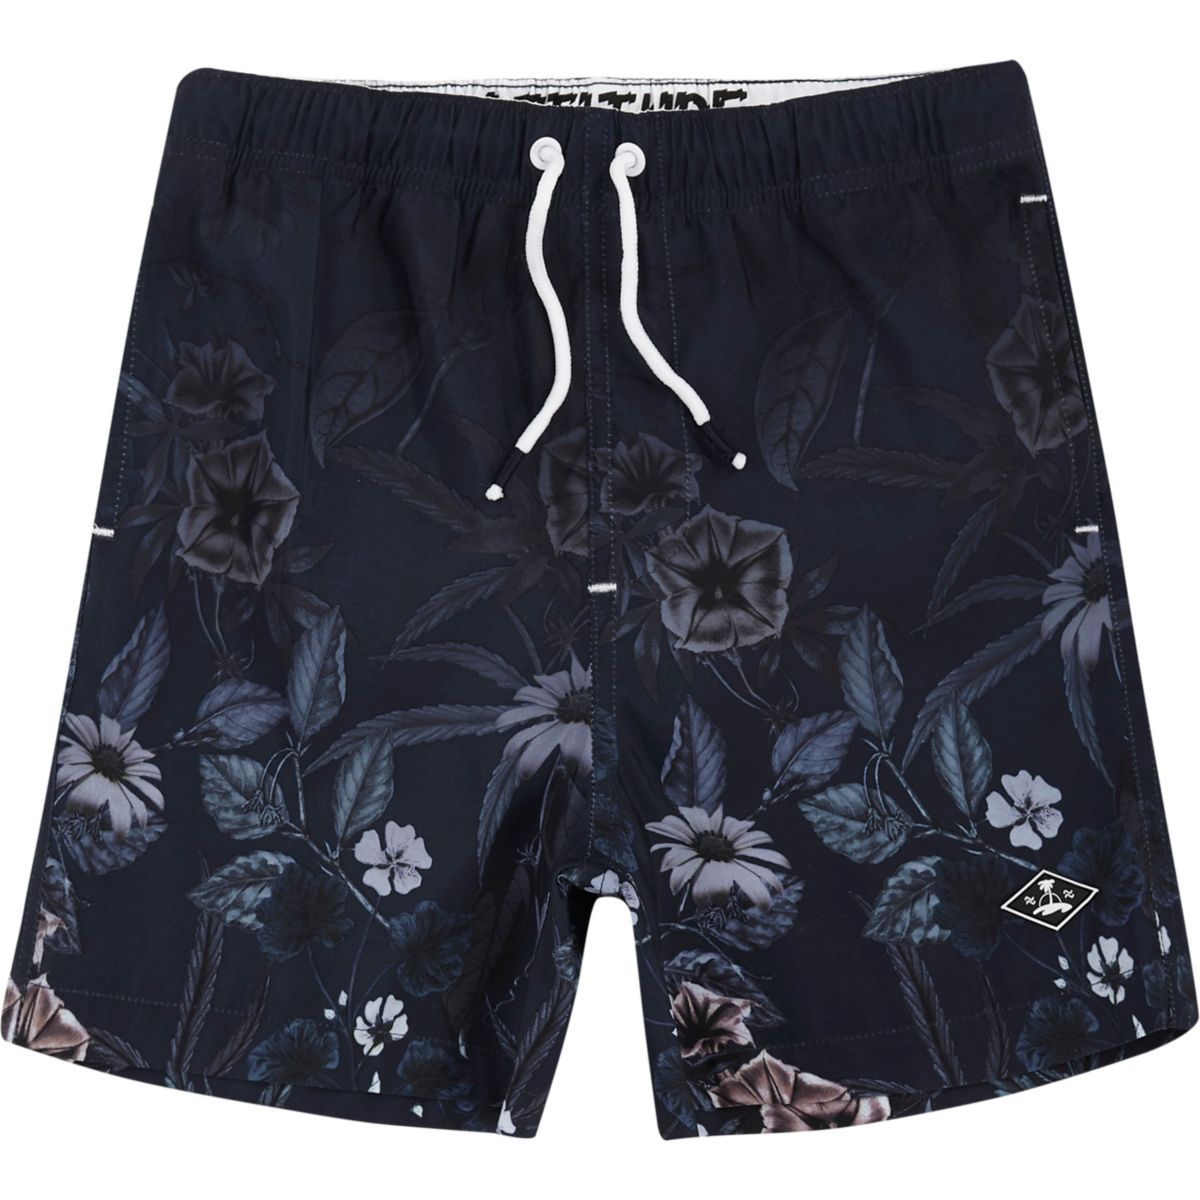 Boys navy floral fade print swim shorts